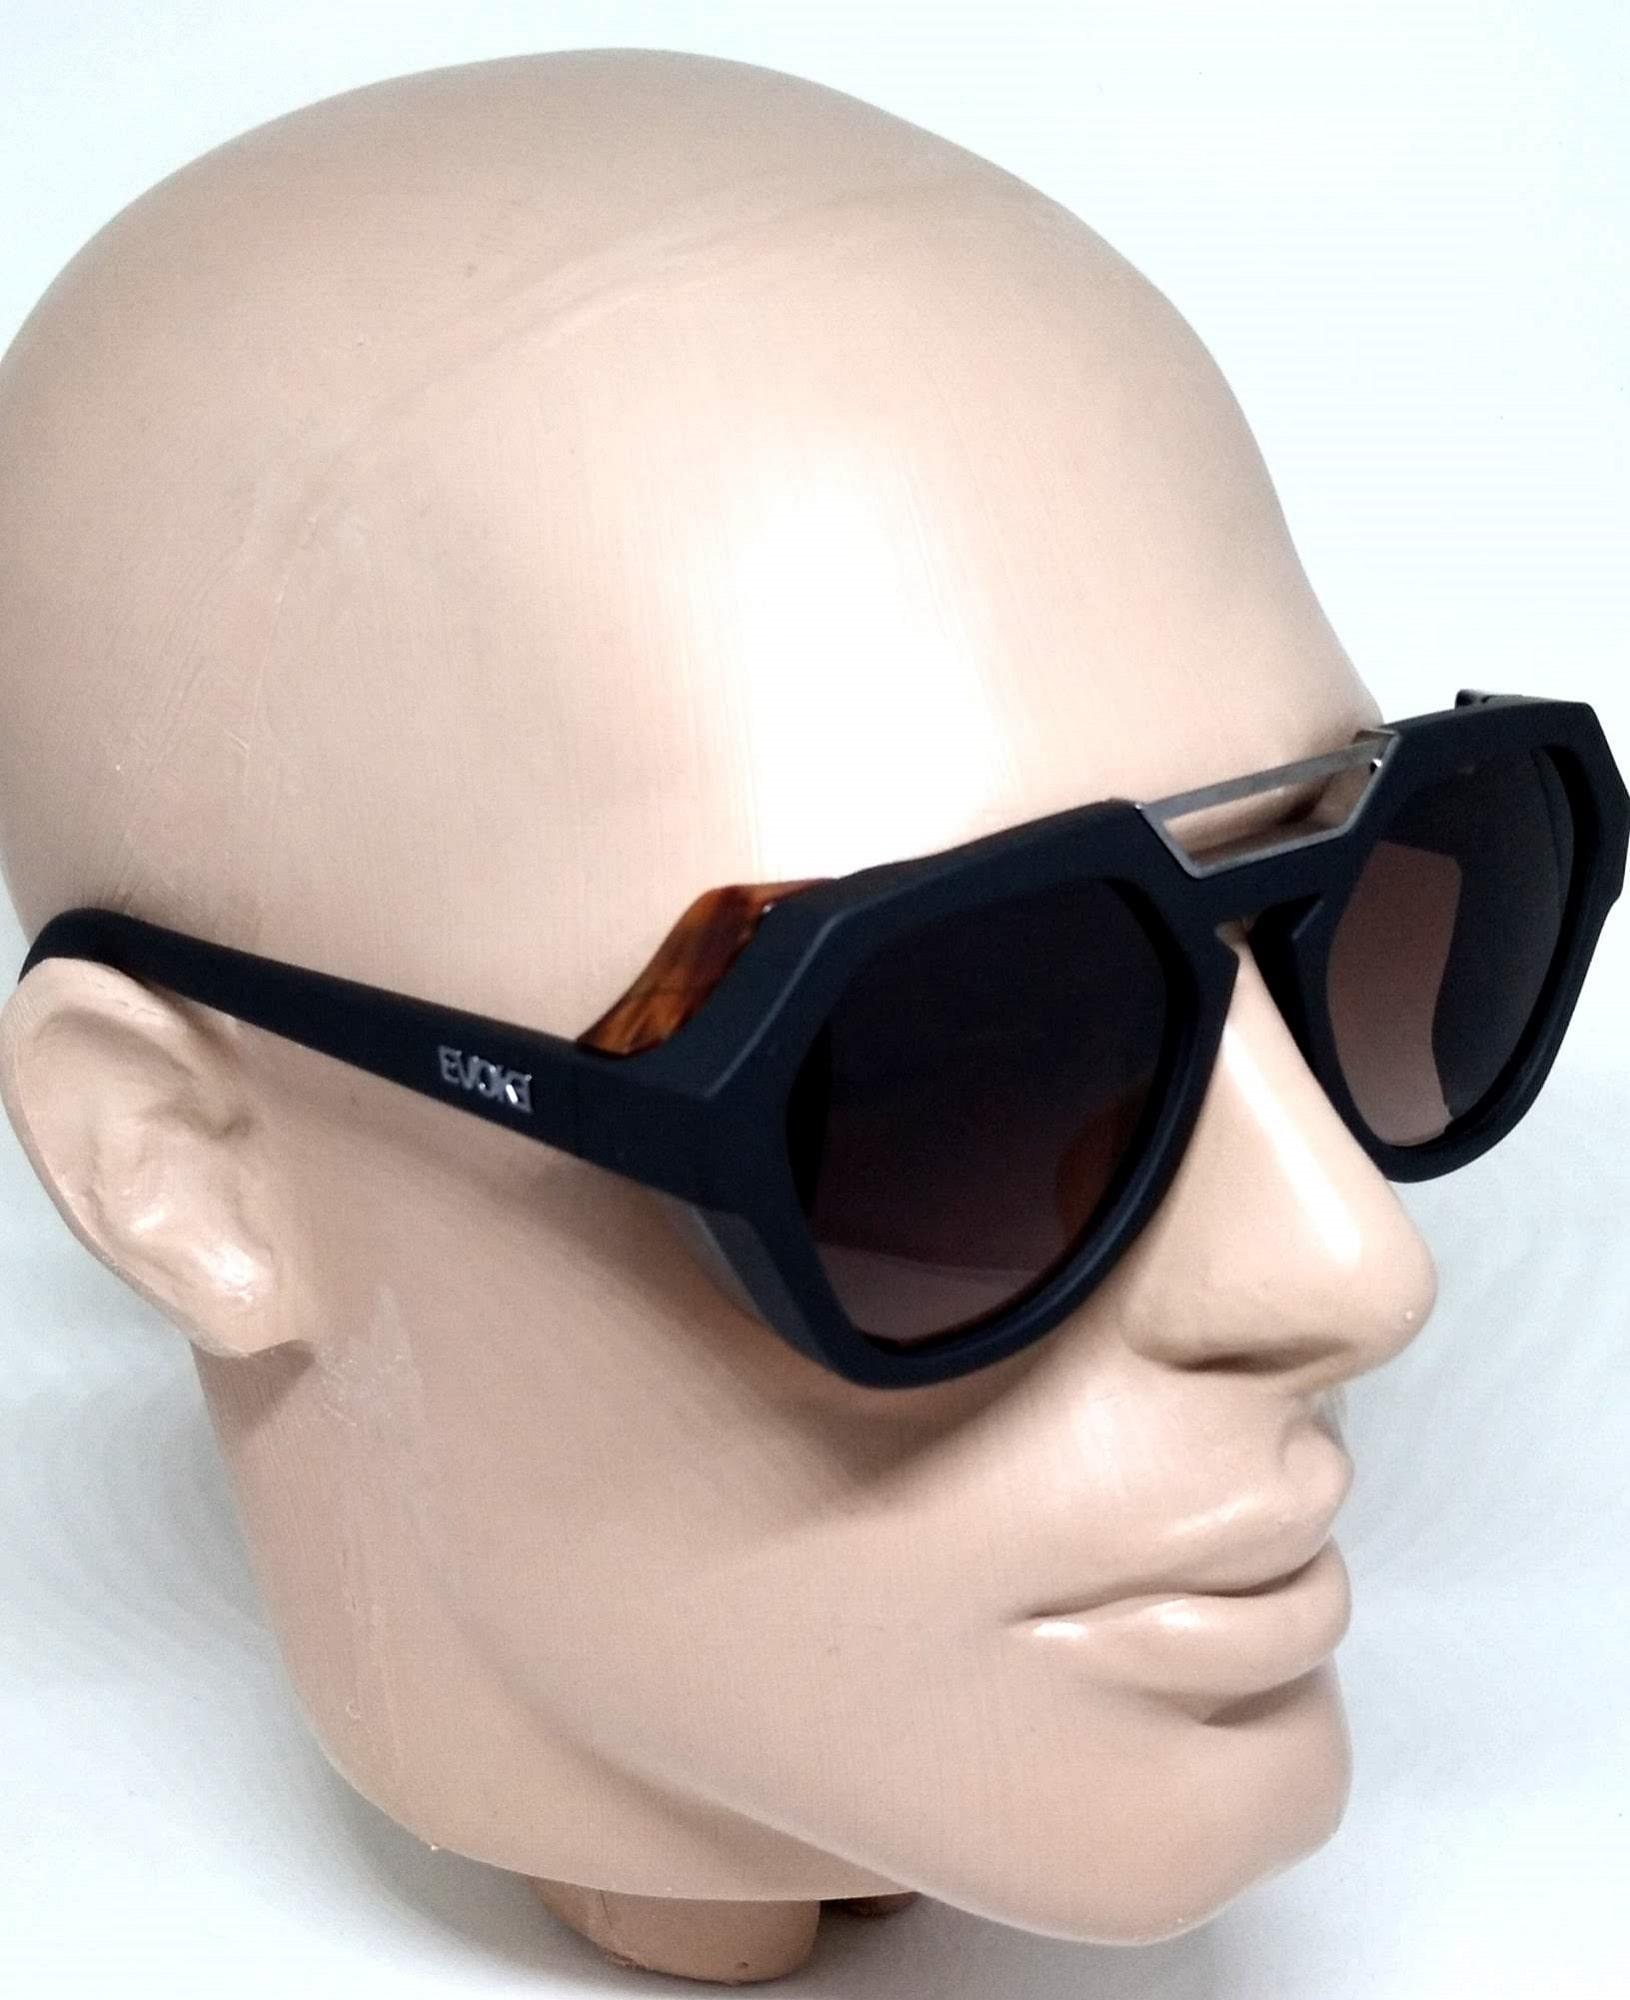 Óculos de Sol Evoke Avalanche Preto Amadeirado Degradê WD01